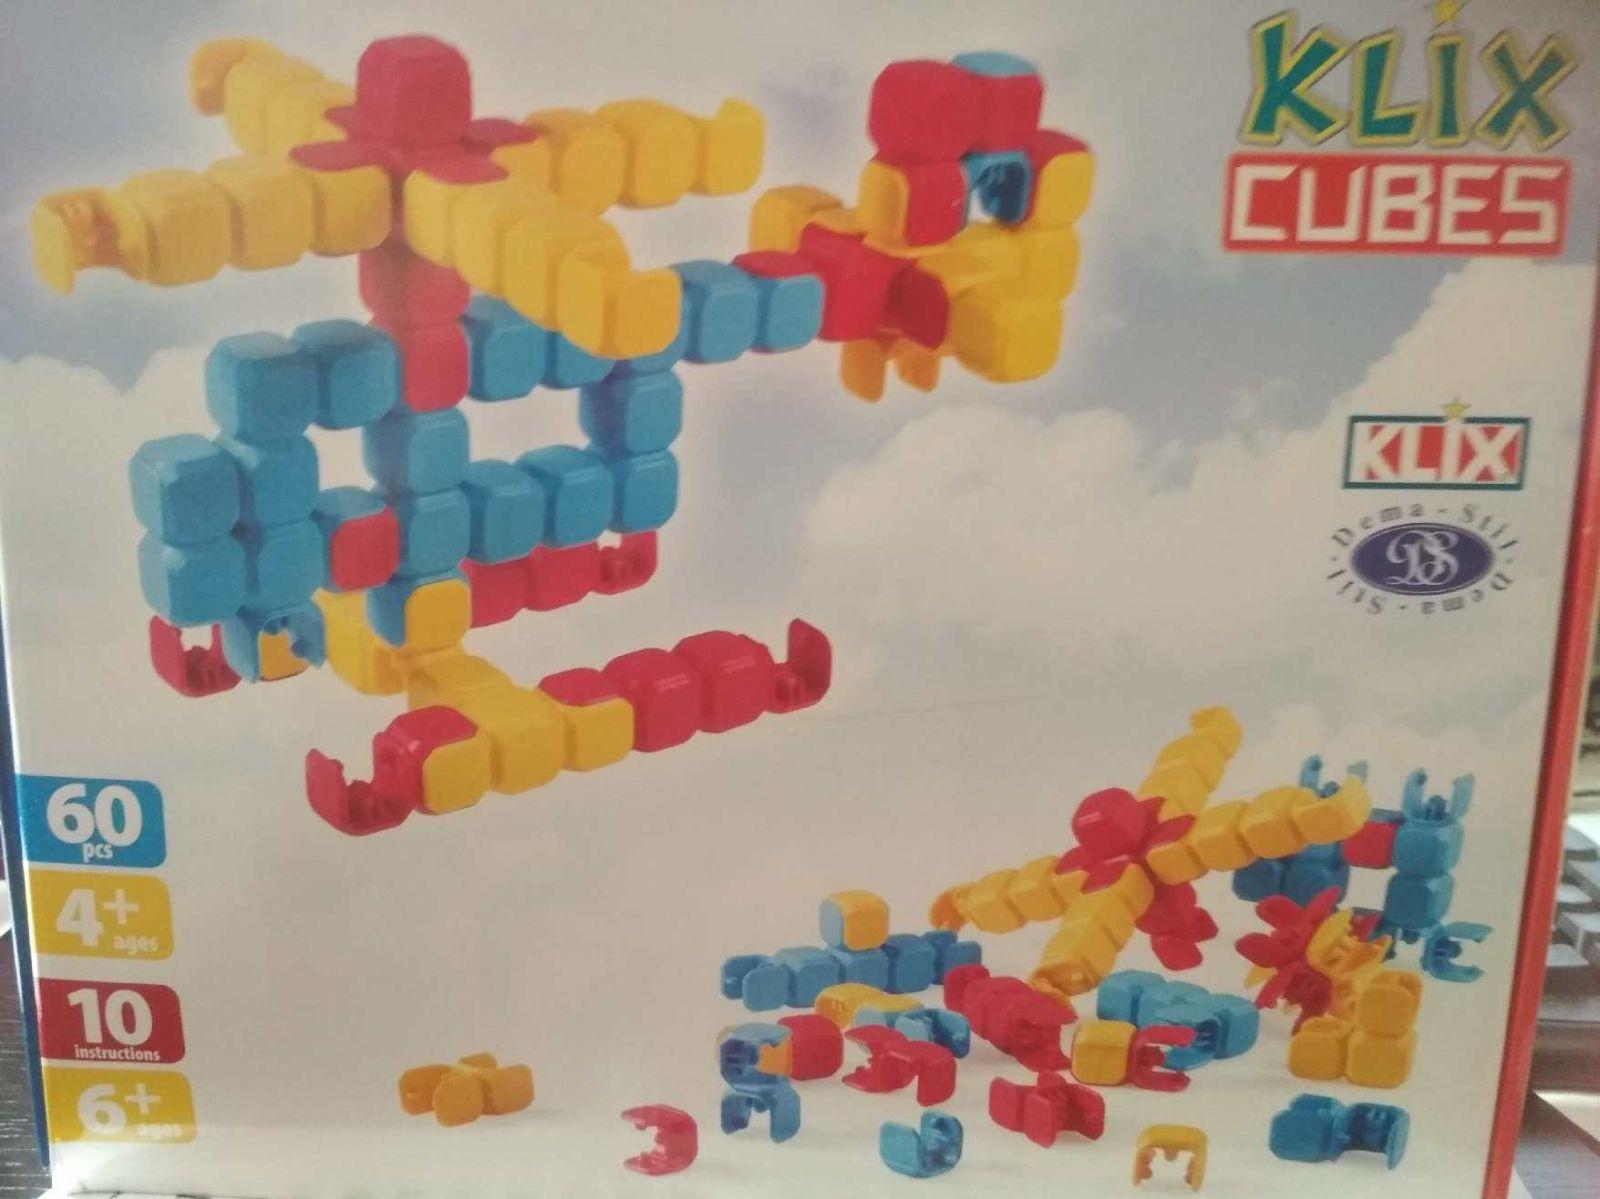 Stavebnice Klix Cubes 60 dílů plast Teddies